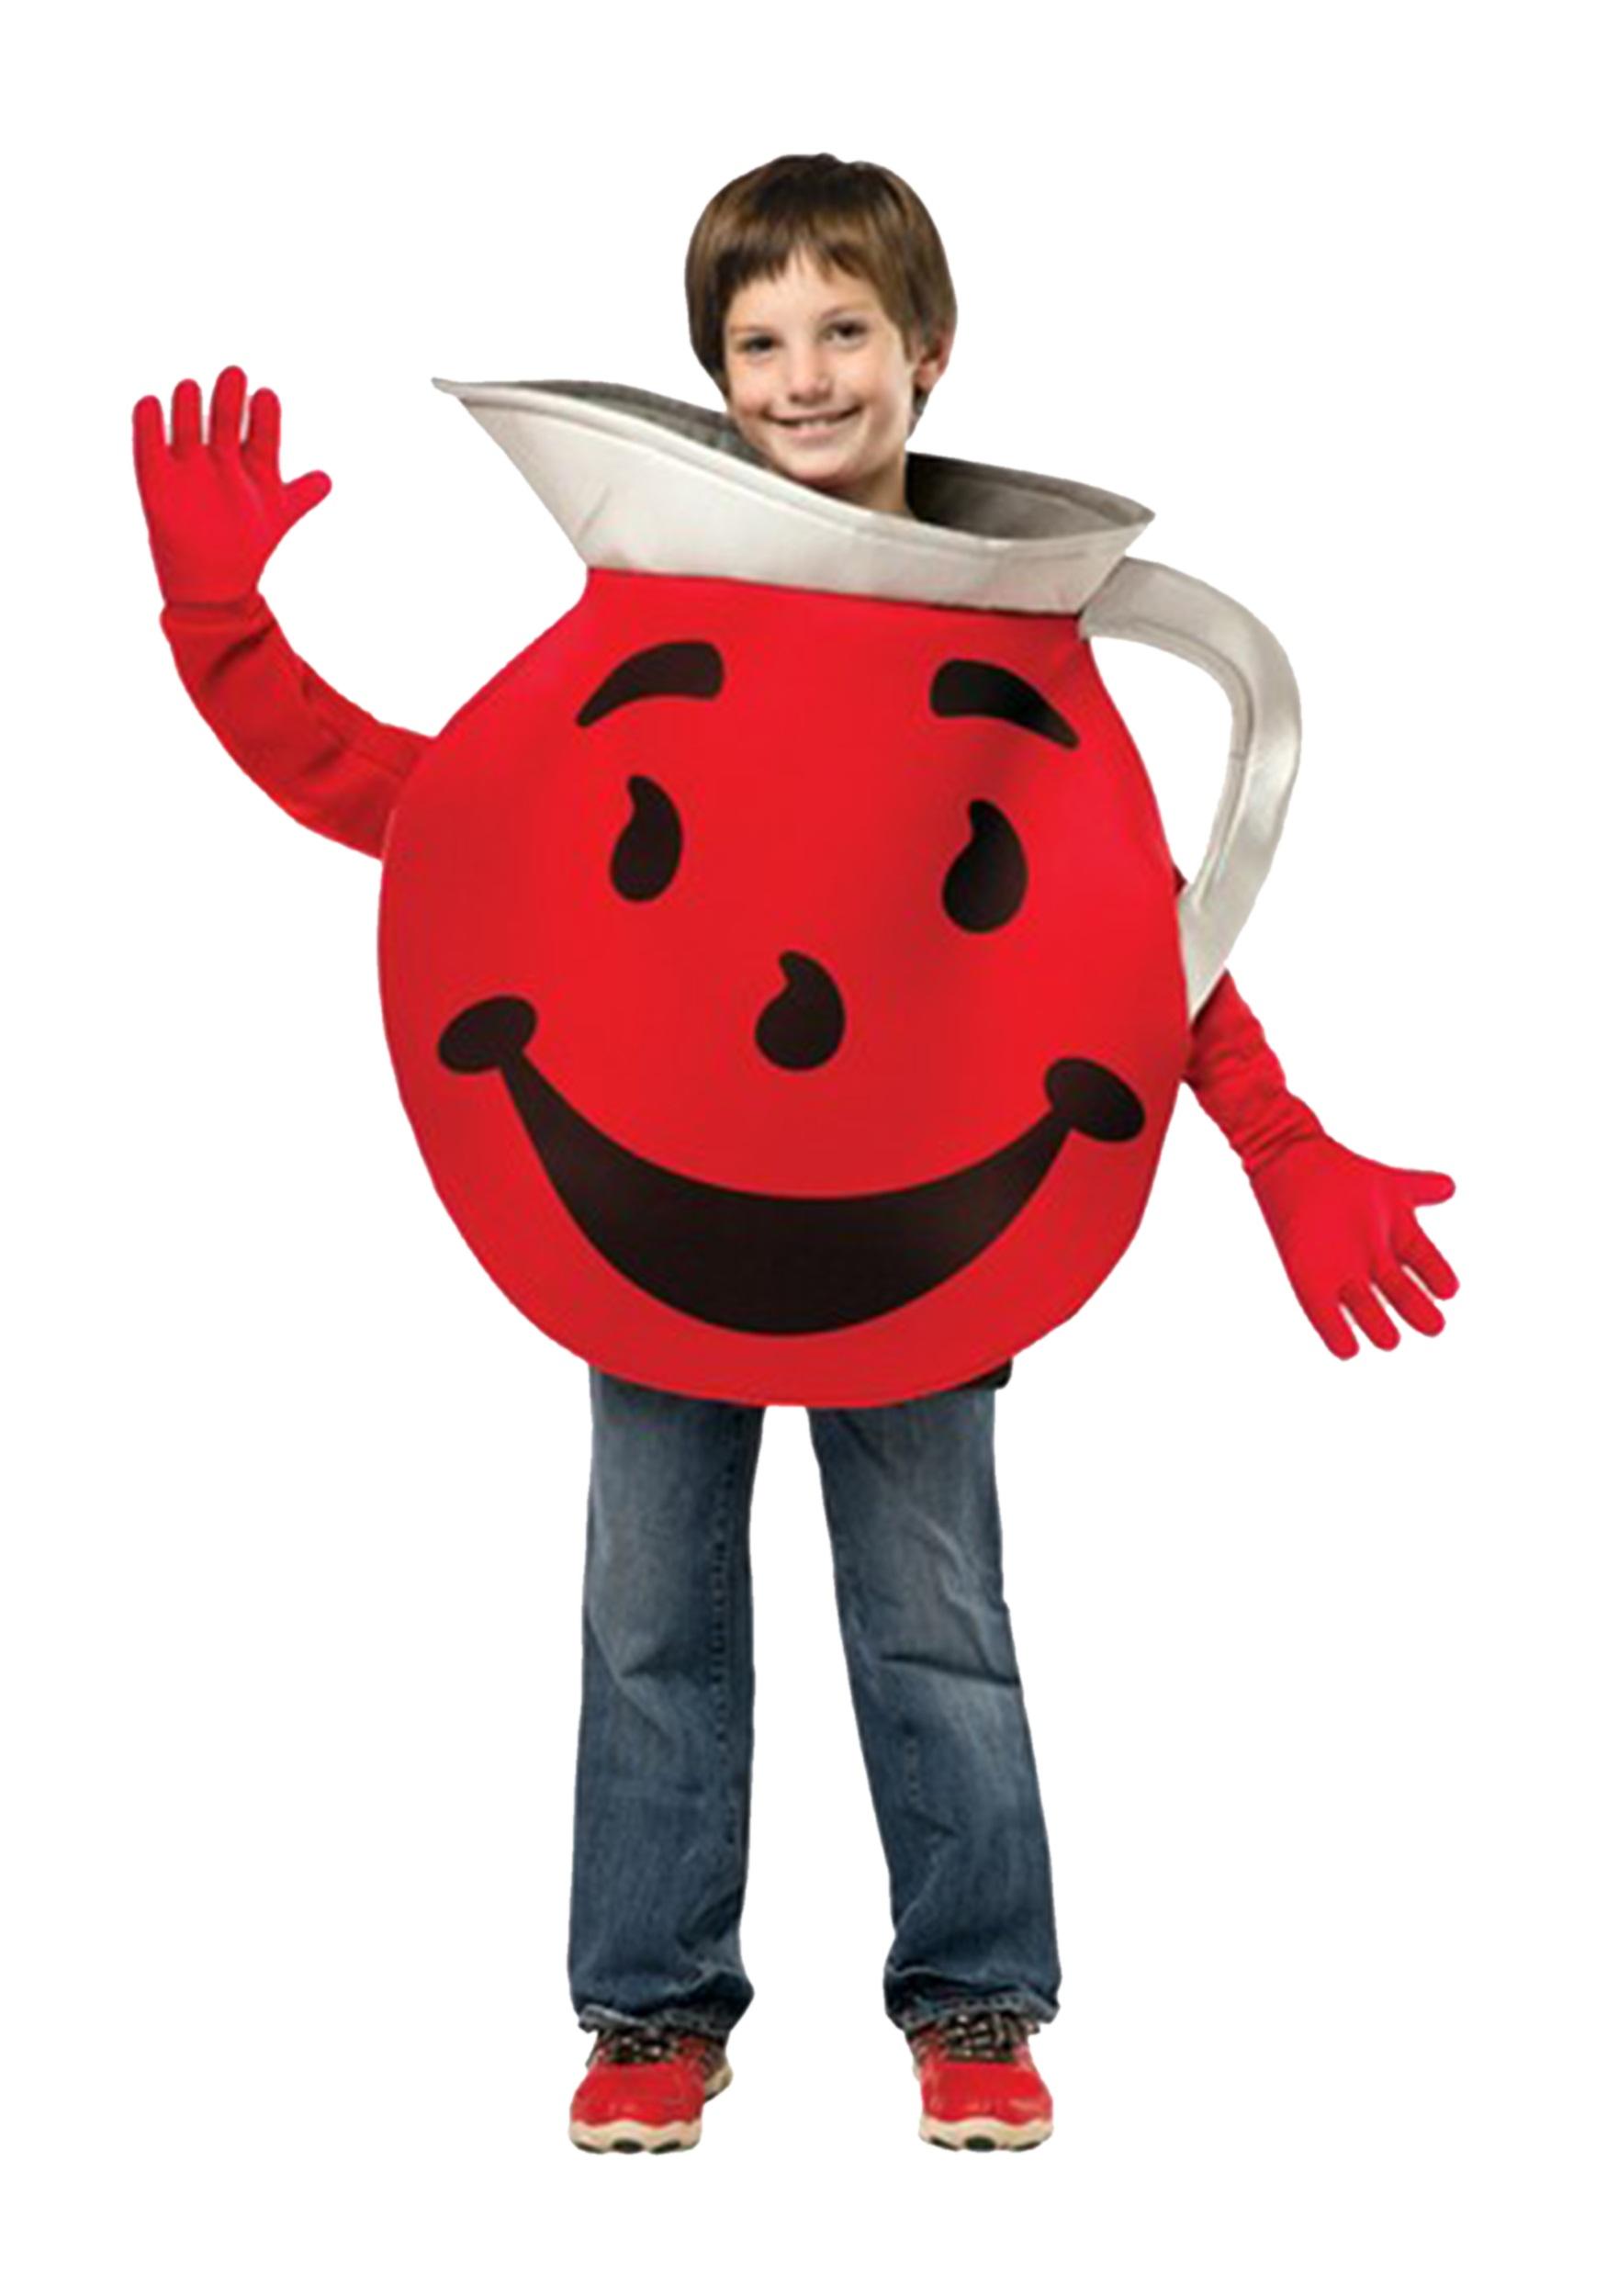 Contemporary Teen Costume Teen Costume Halloween Costumes Kool Aid Man Oh No Kool Aid Man Pitcher nice food Kool Aid Man